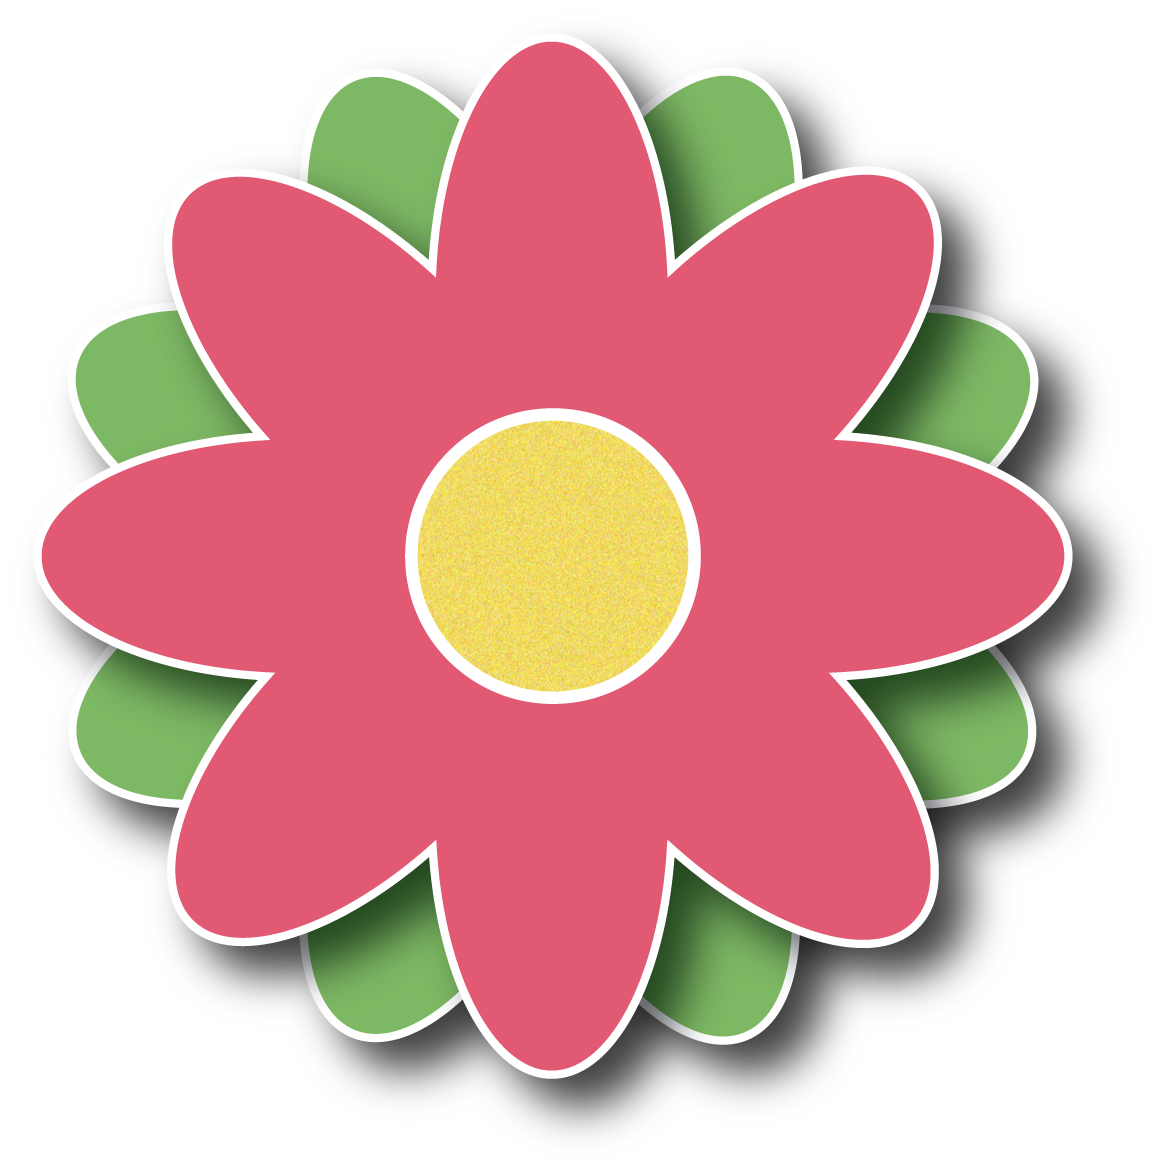 Clip Art Free Images Flowers